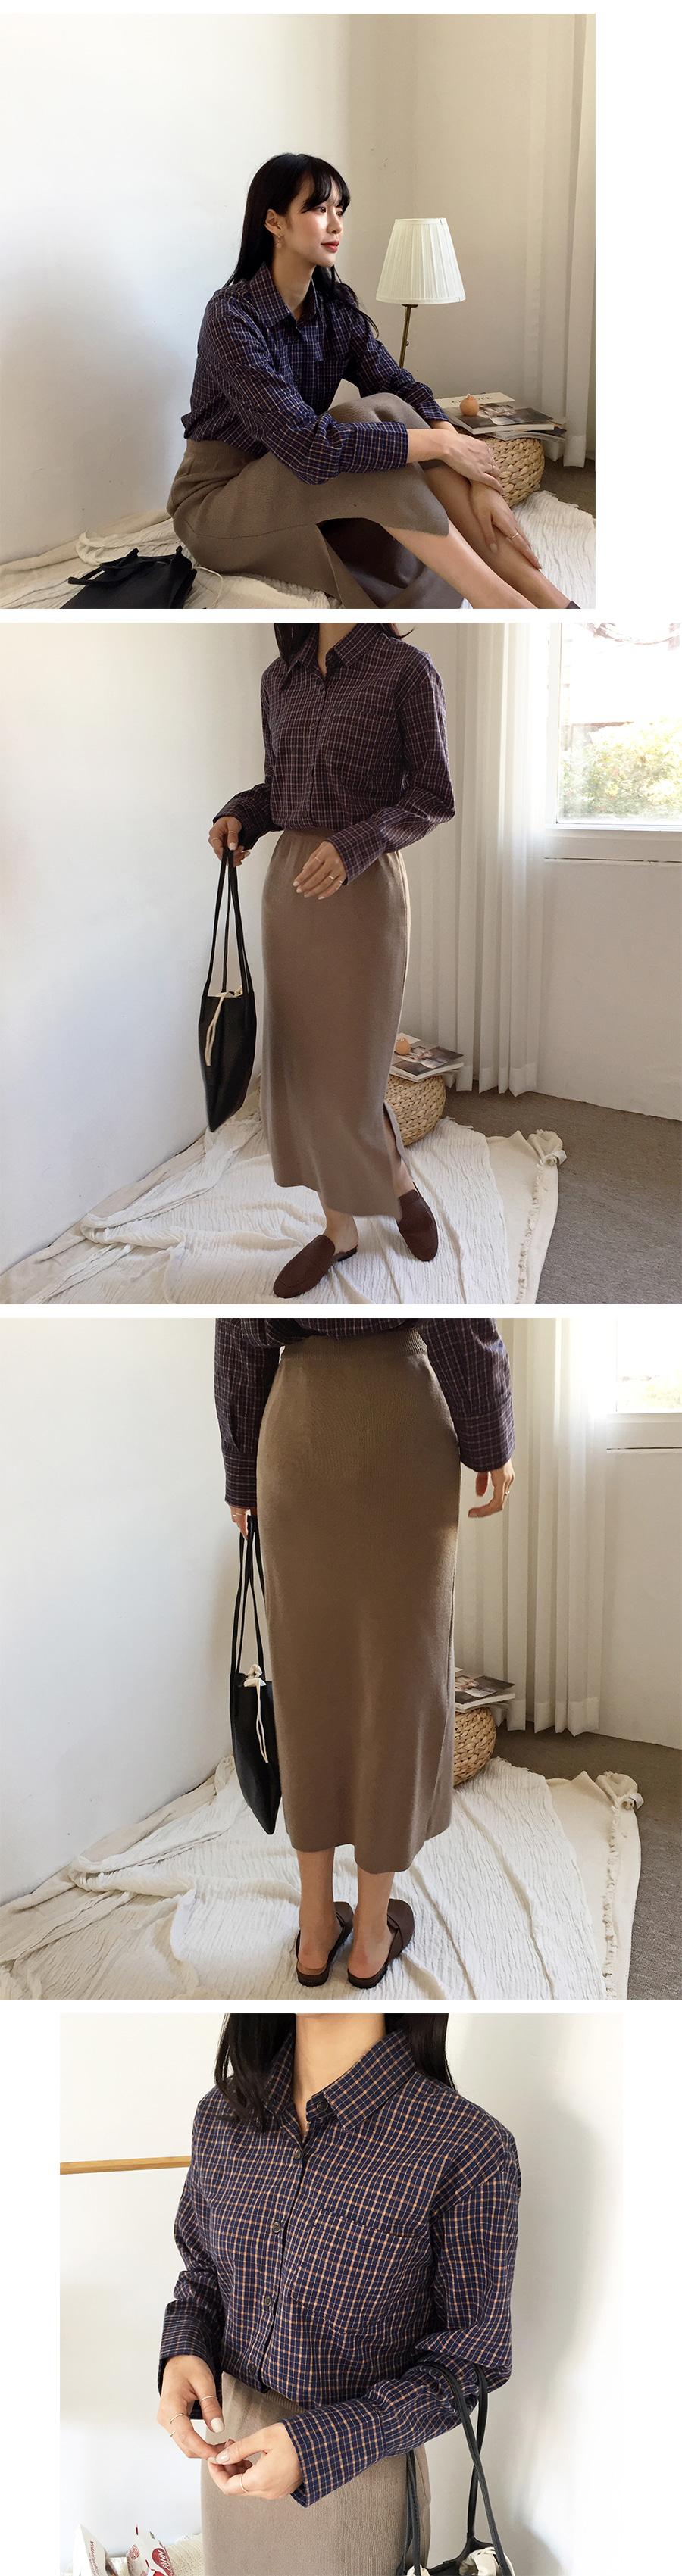 Toddy banding long skirt